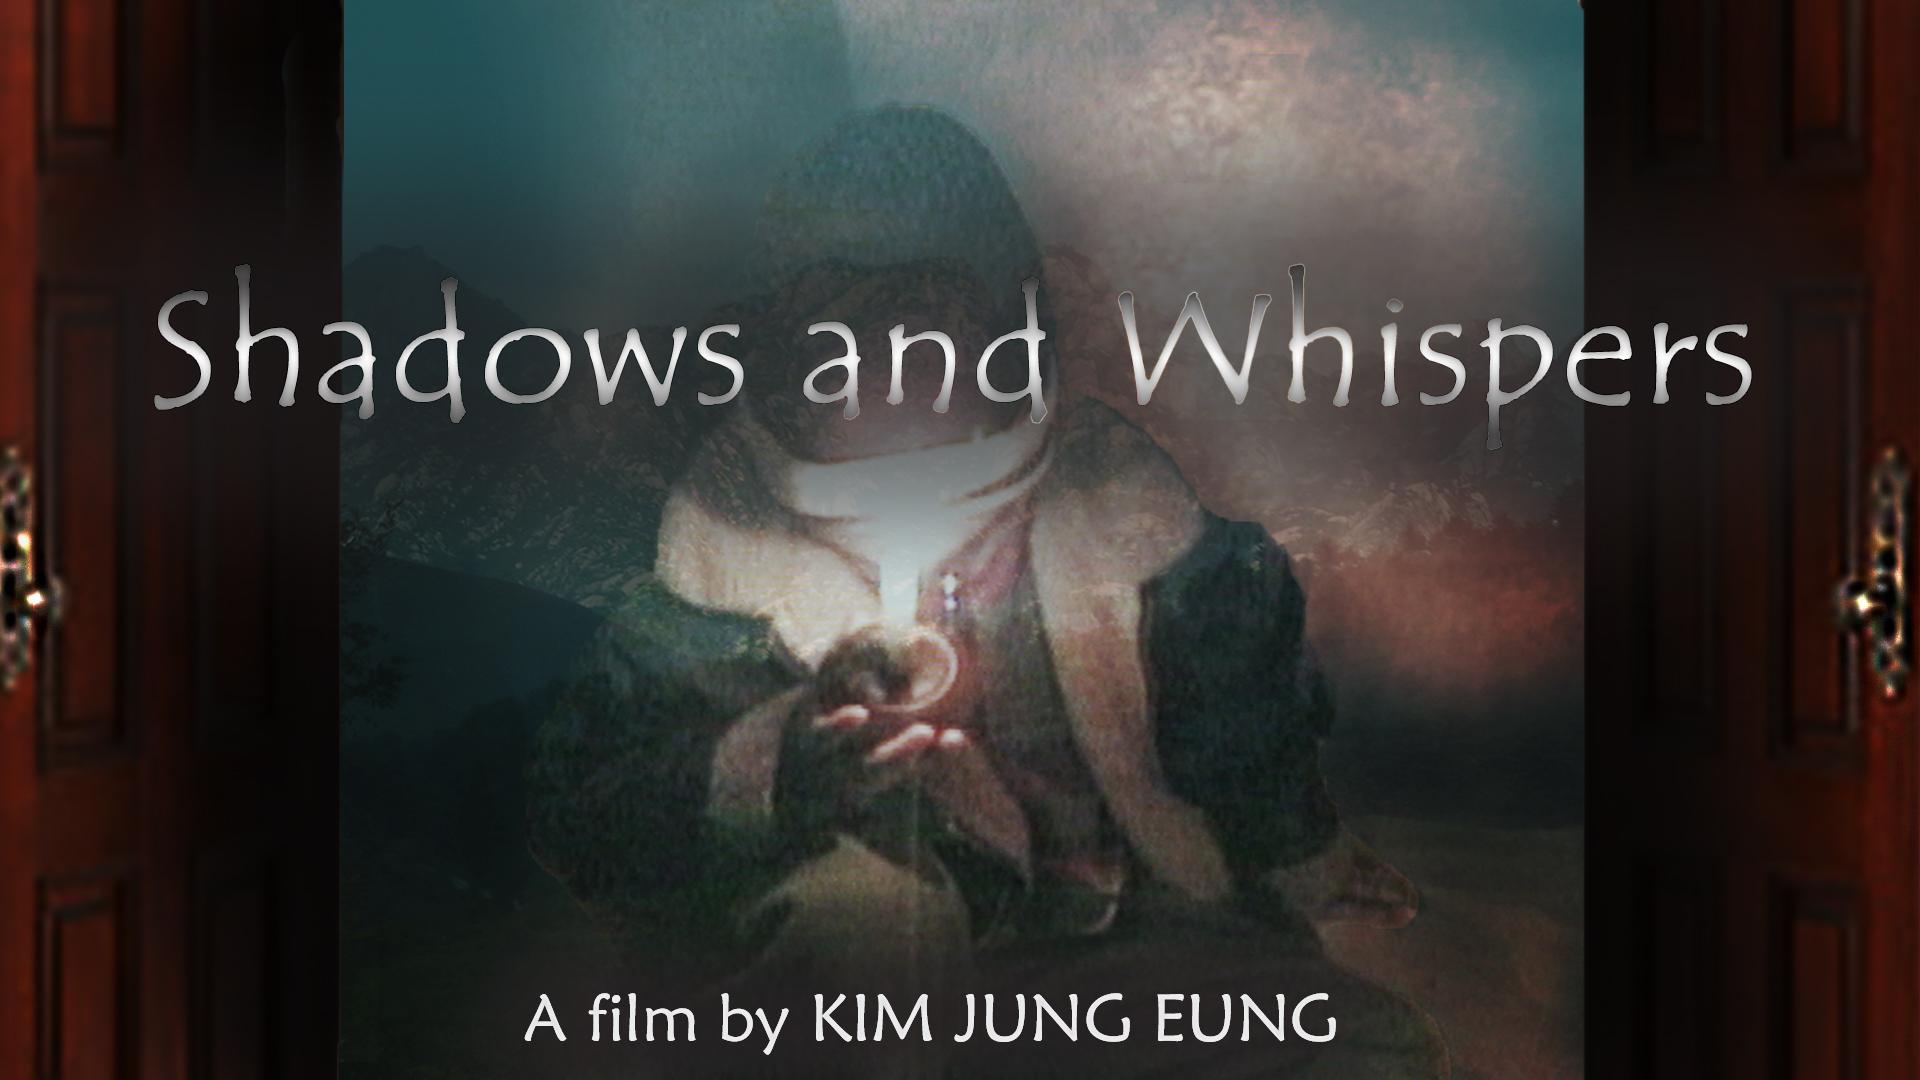 North Korea: Shadows and Whispers